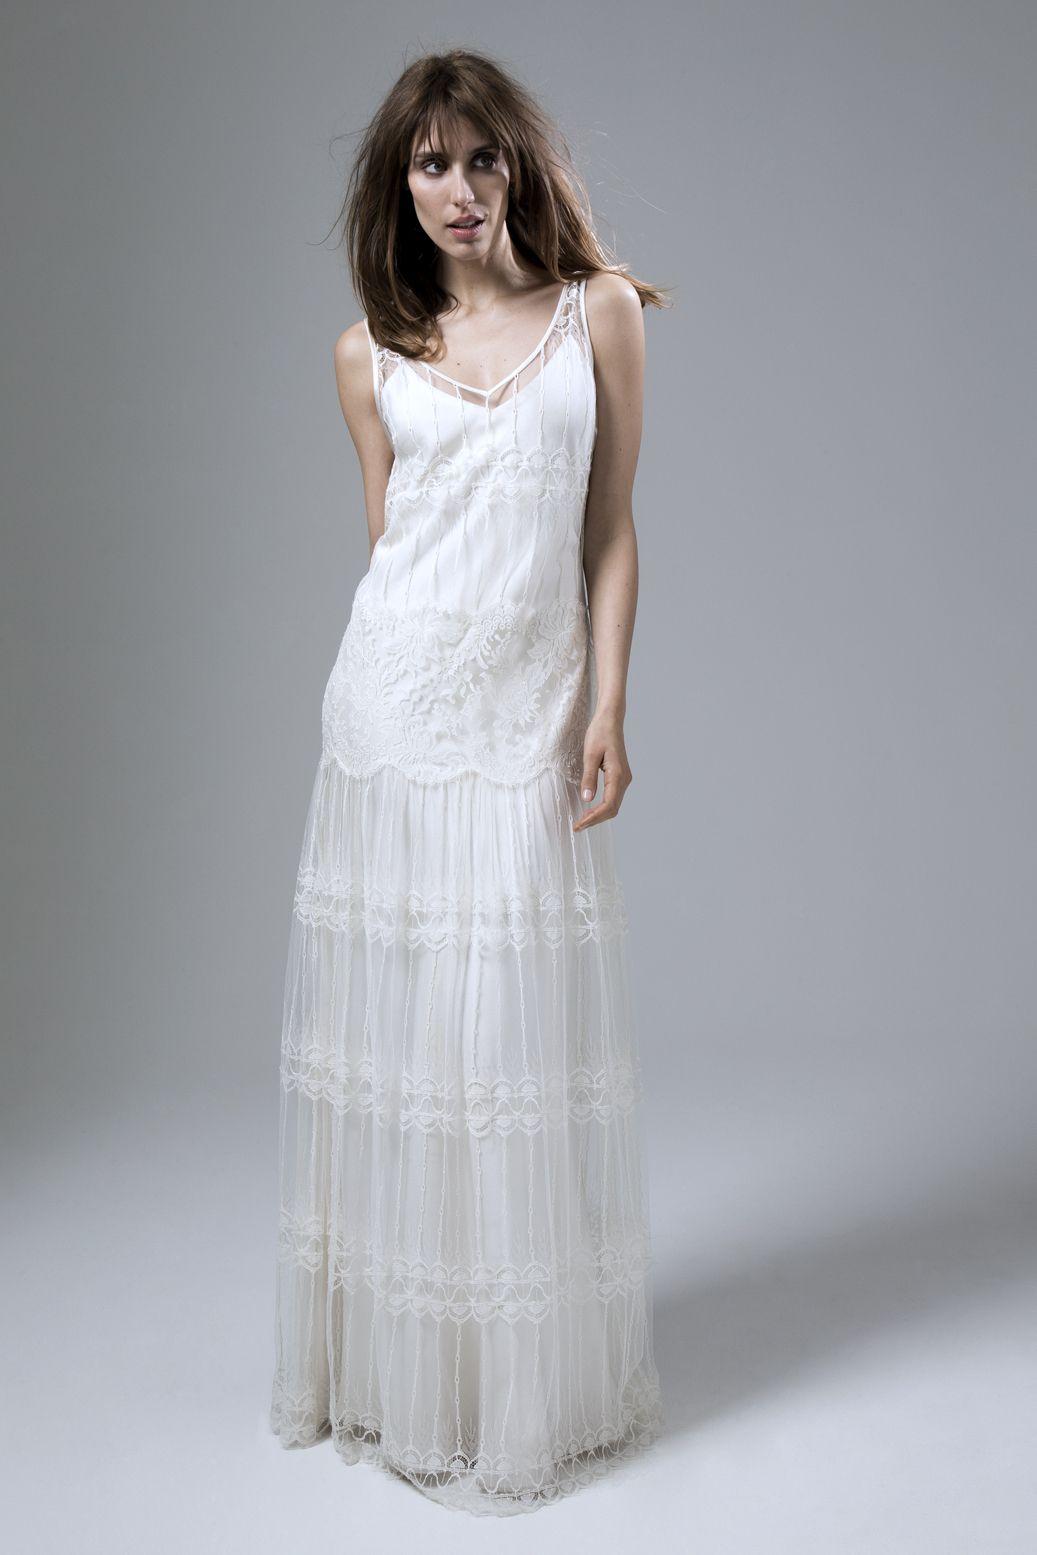 Bridal fashion lace v neck straight dress slip french lace